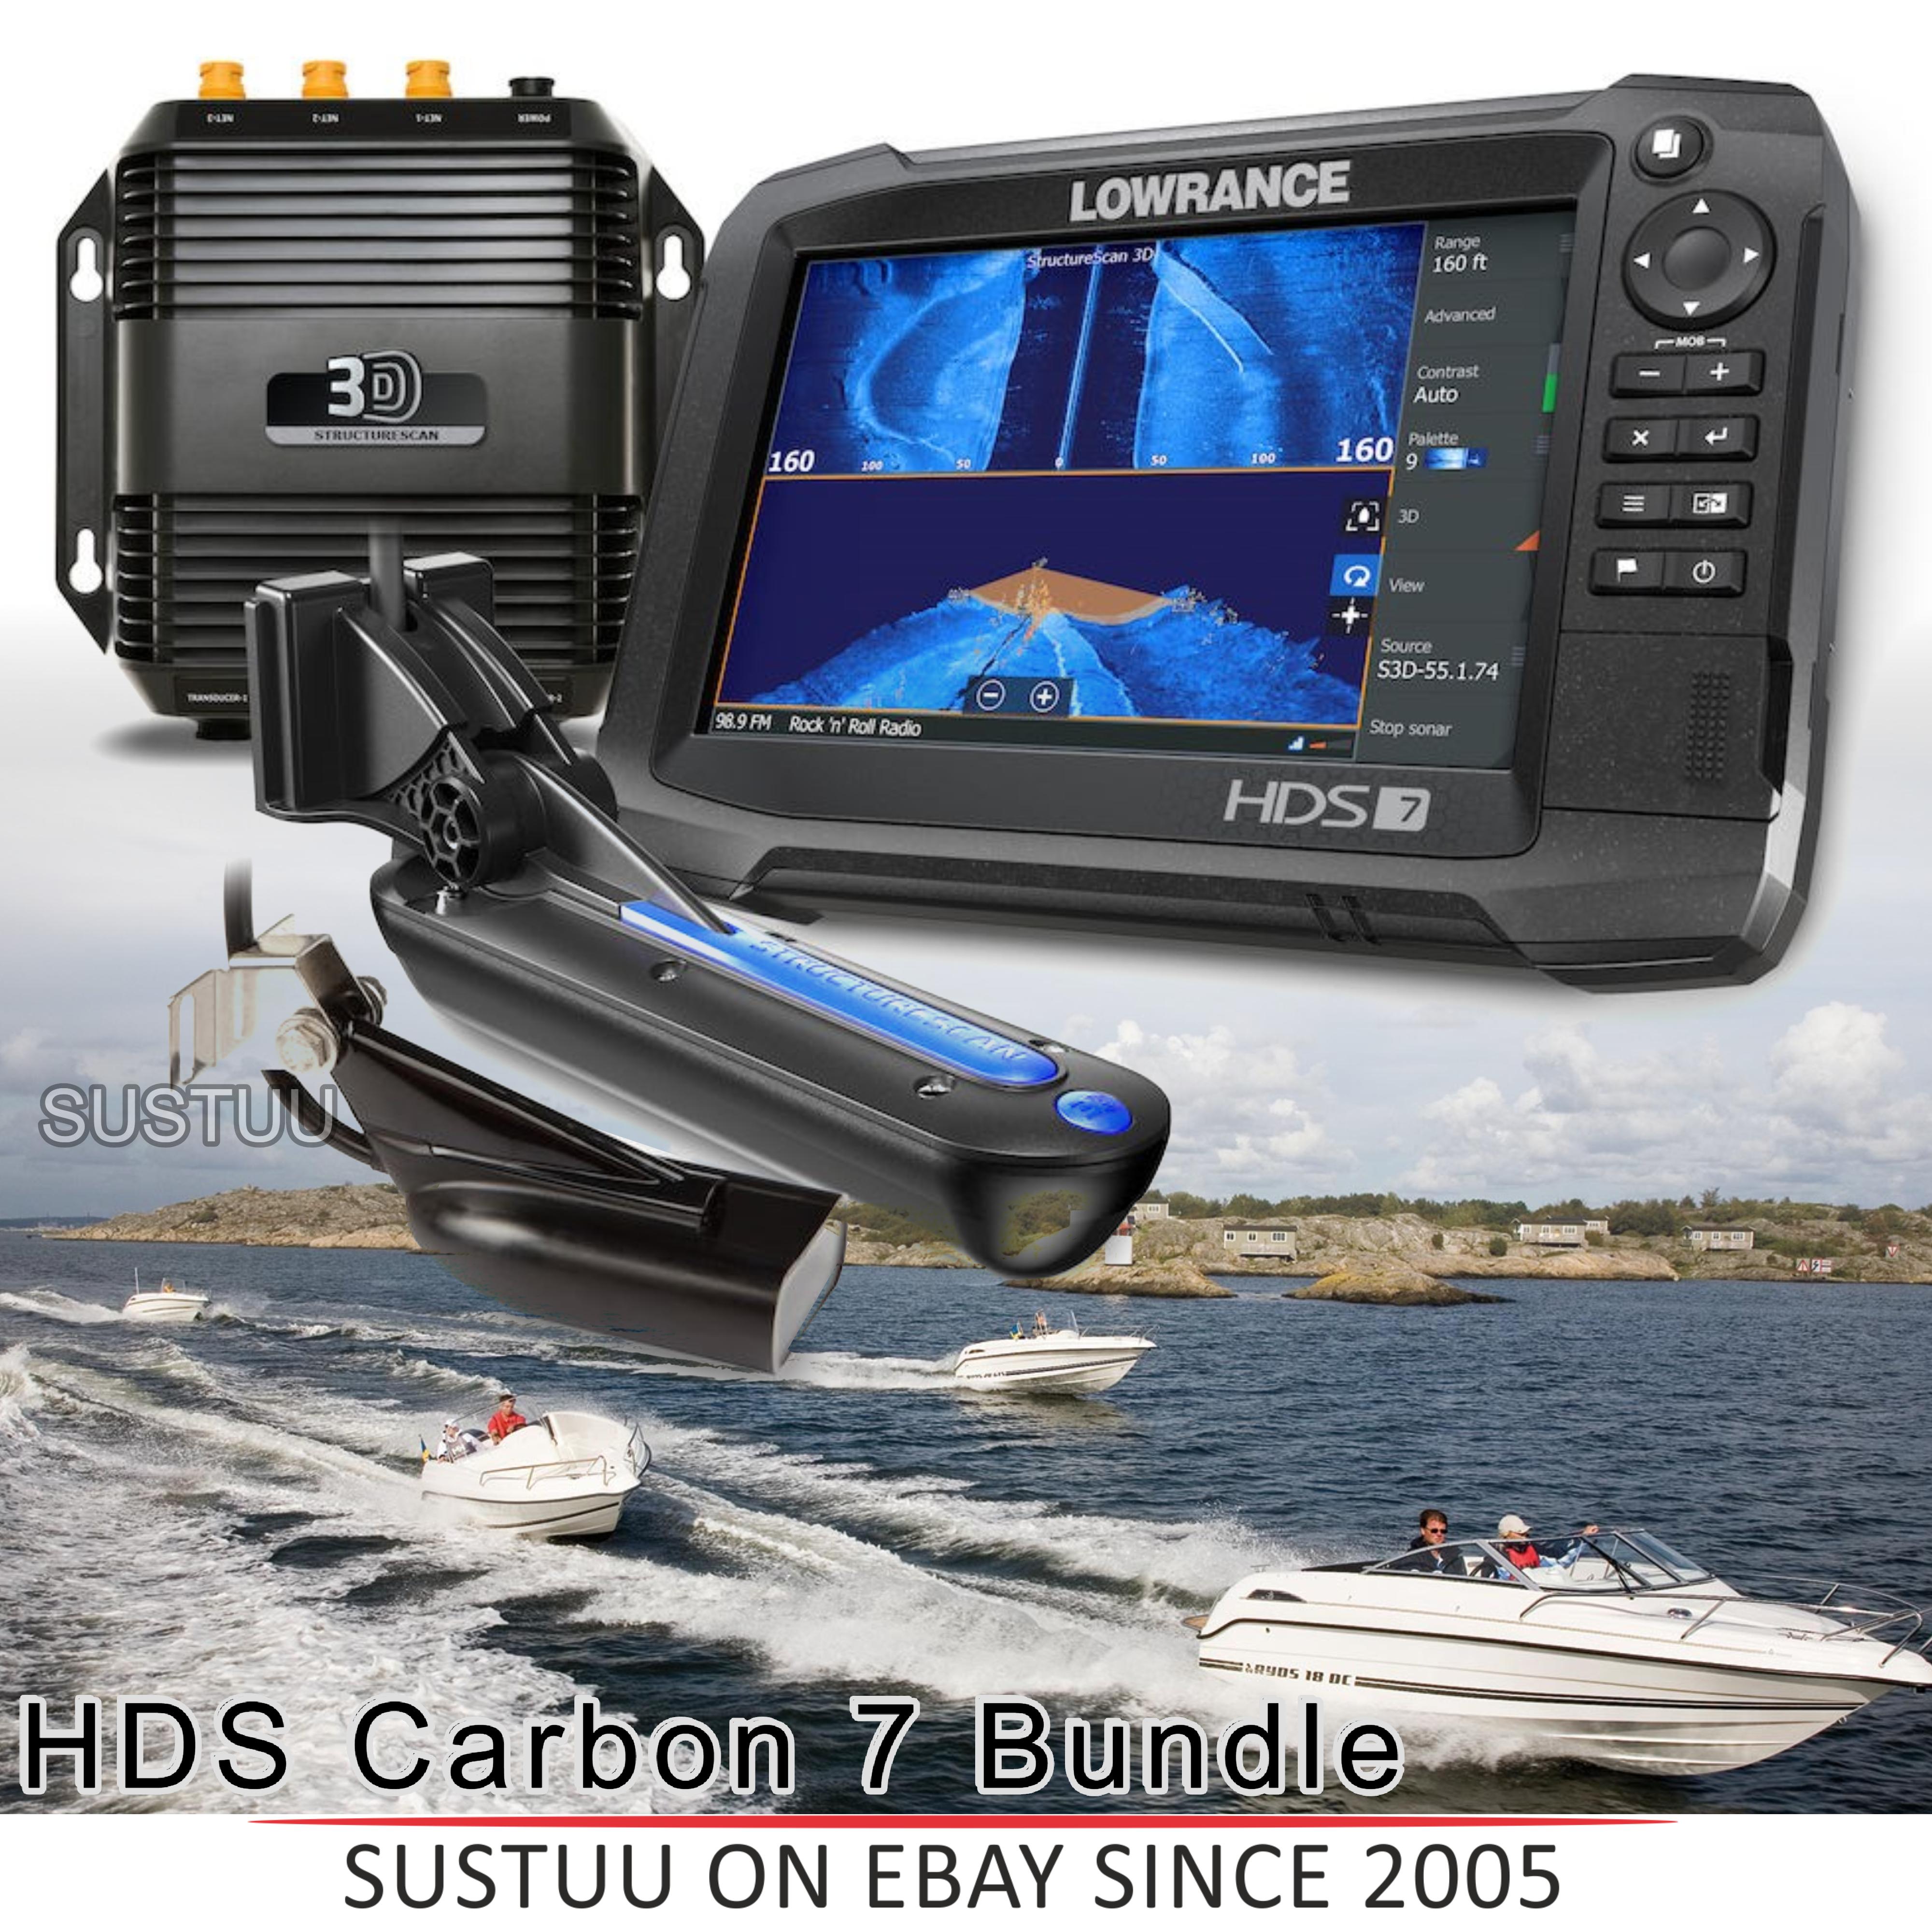 Lowrance HDS-7 Carbon MFD & Skimmer/ StructureScan 3D